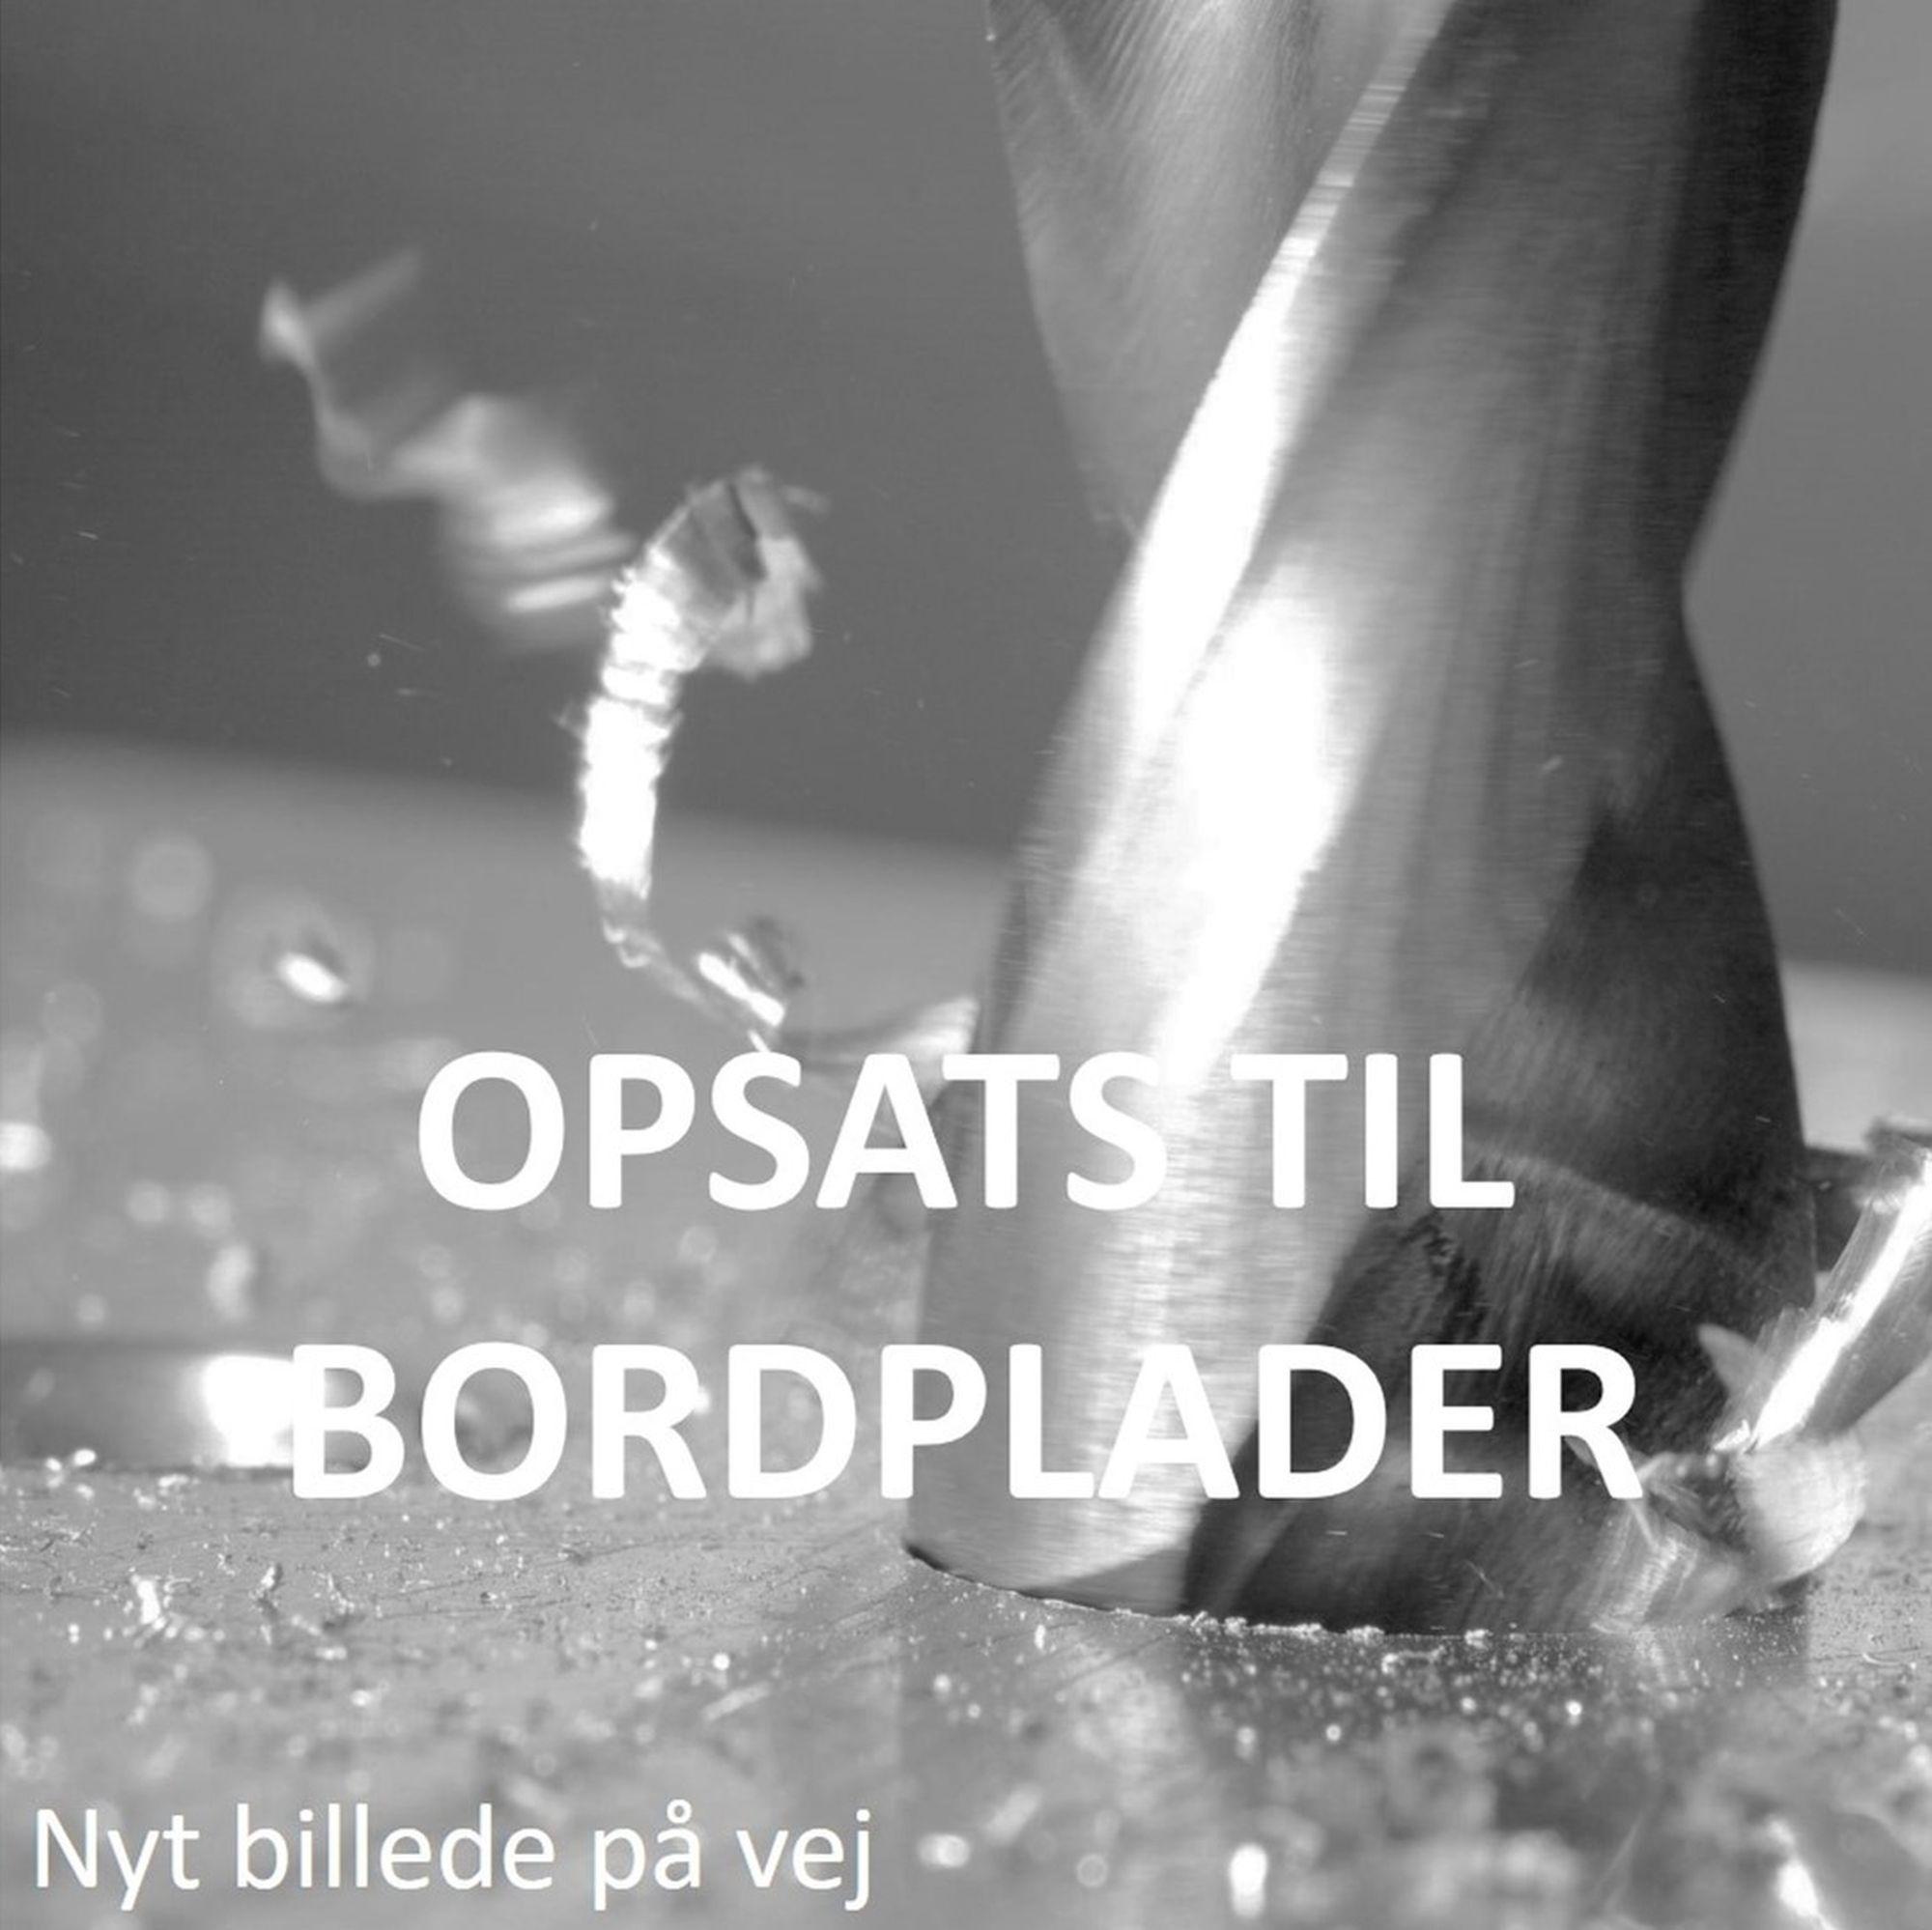 Wilno Rustfri ApS - Kvistgård